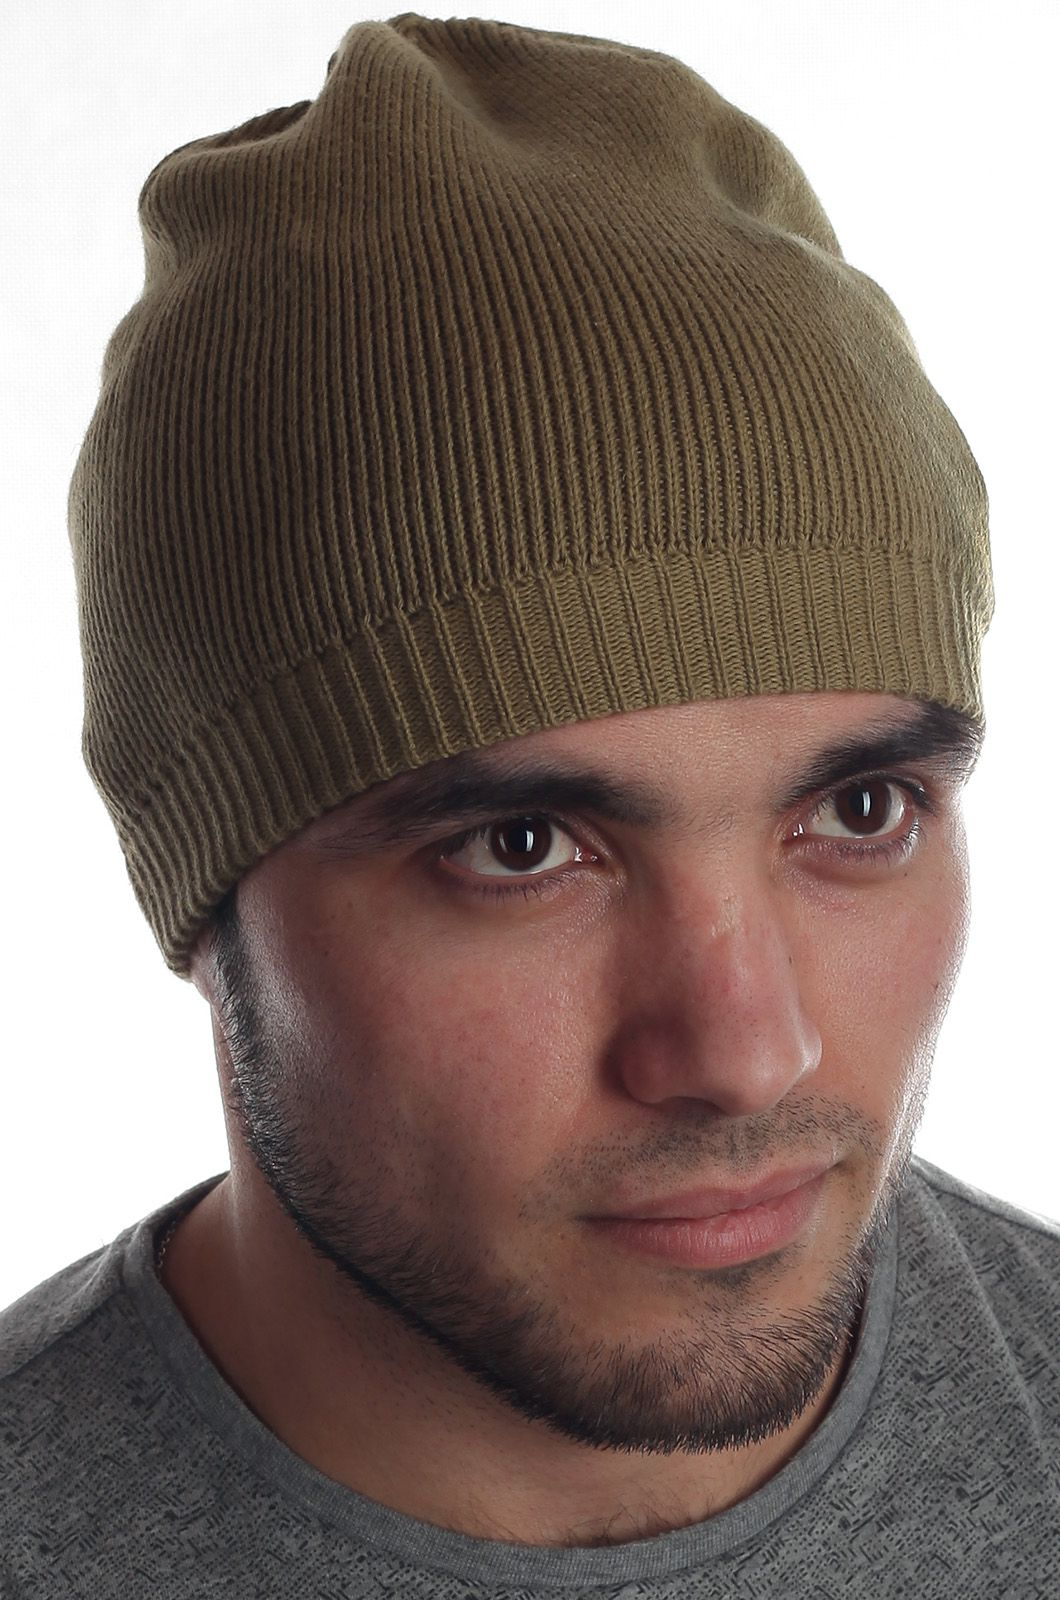 Купить стильную шапку для мужчин онлайн